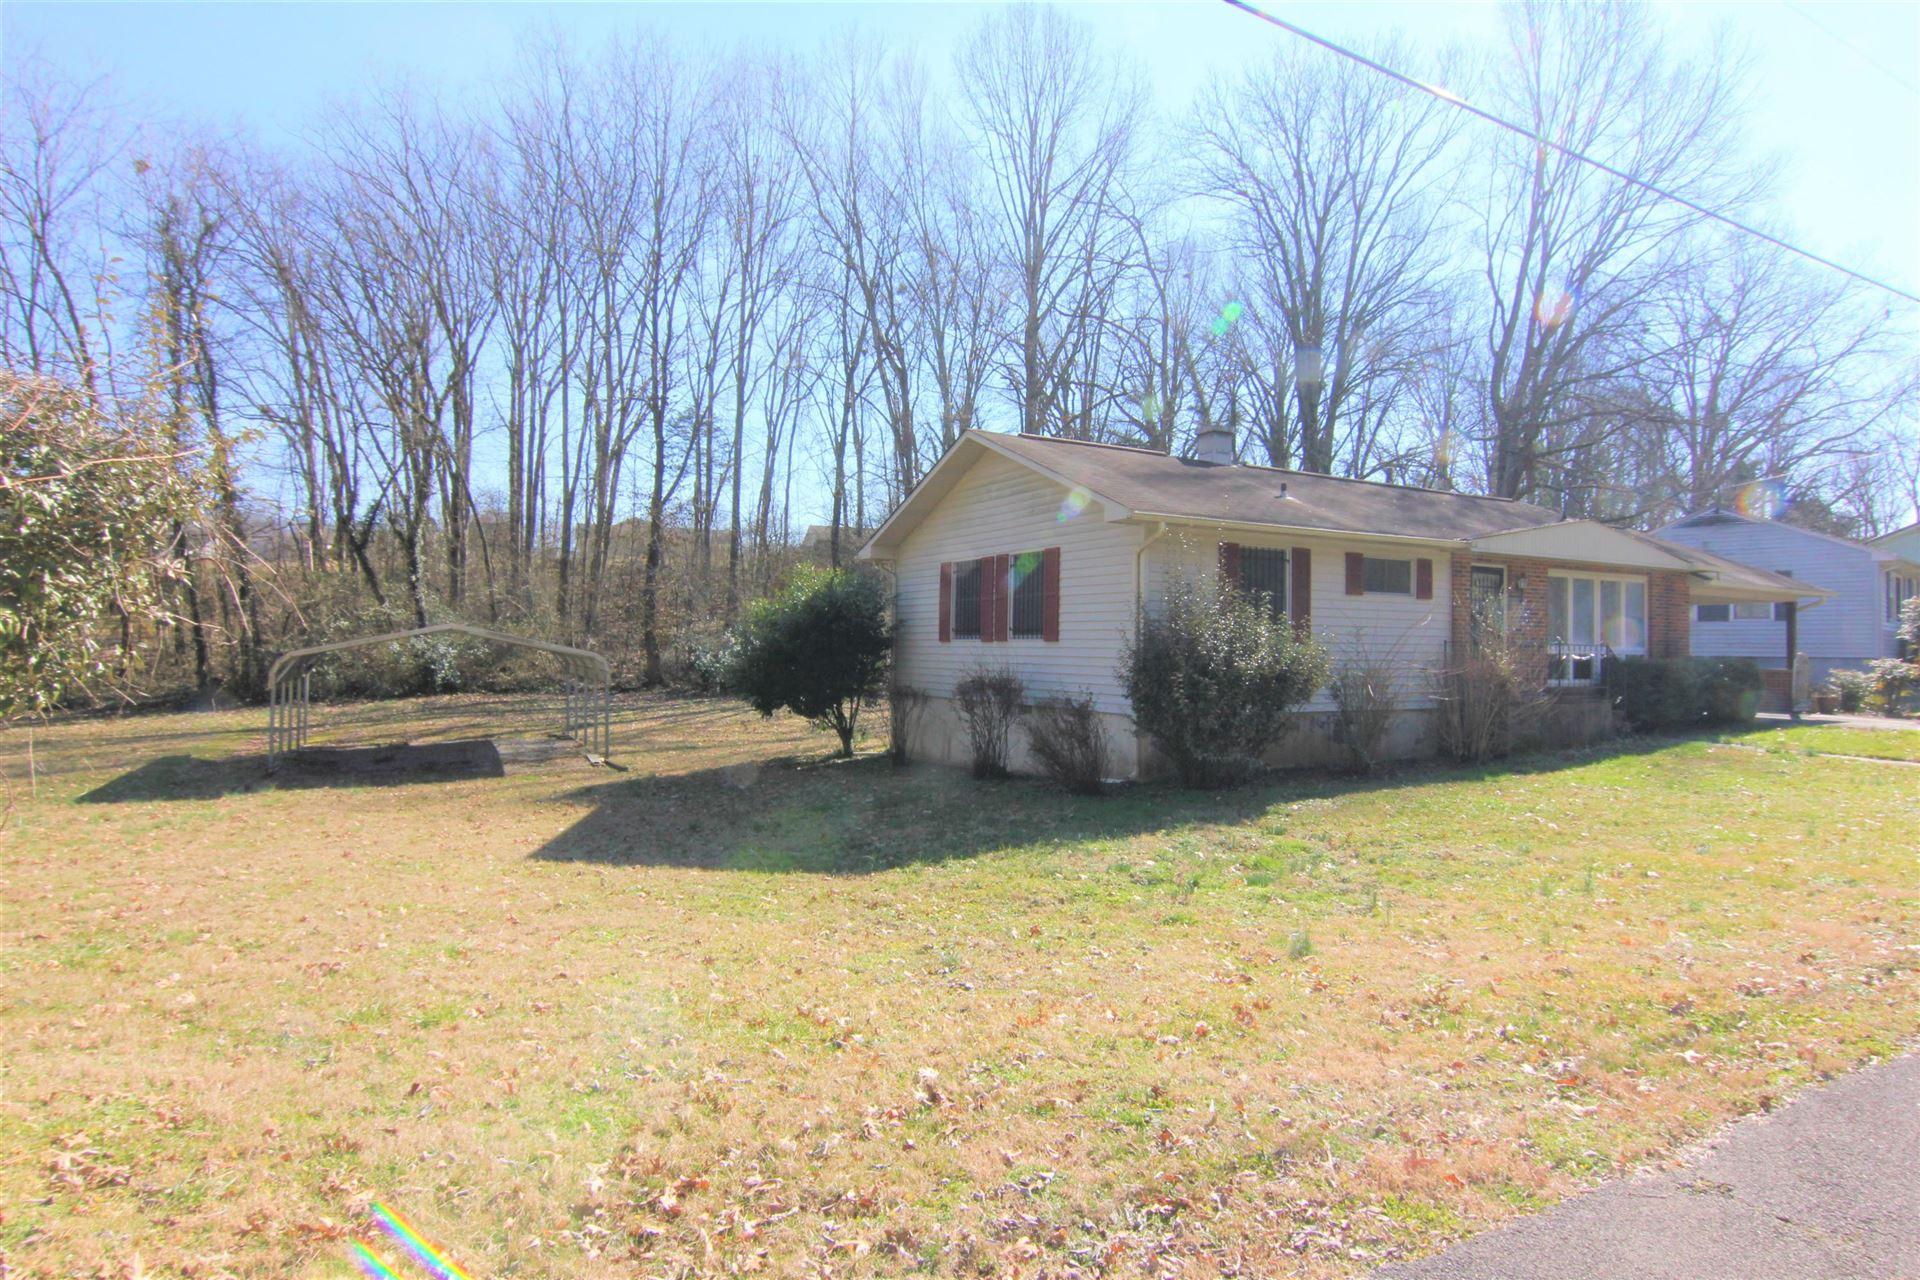 Photo of 126 Atlanta Rd, Oak Ridge, TN 37830 (MLS # 1143517)